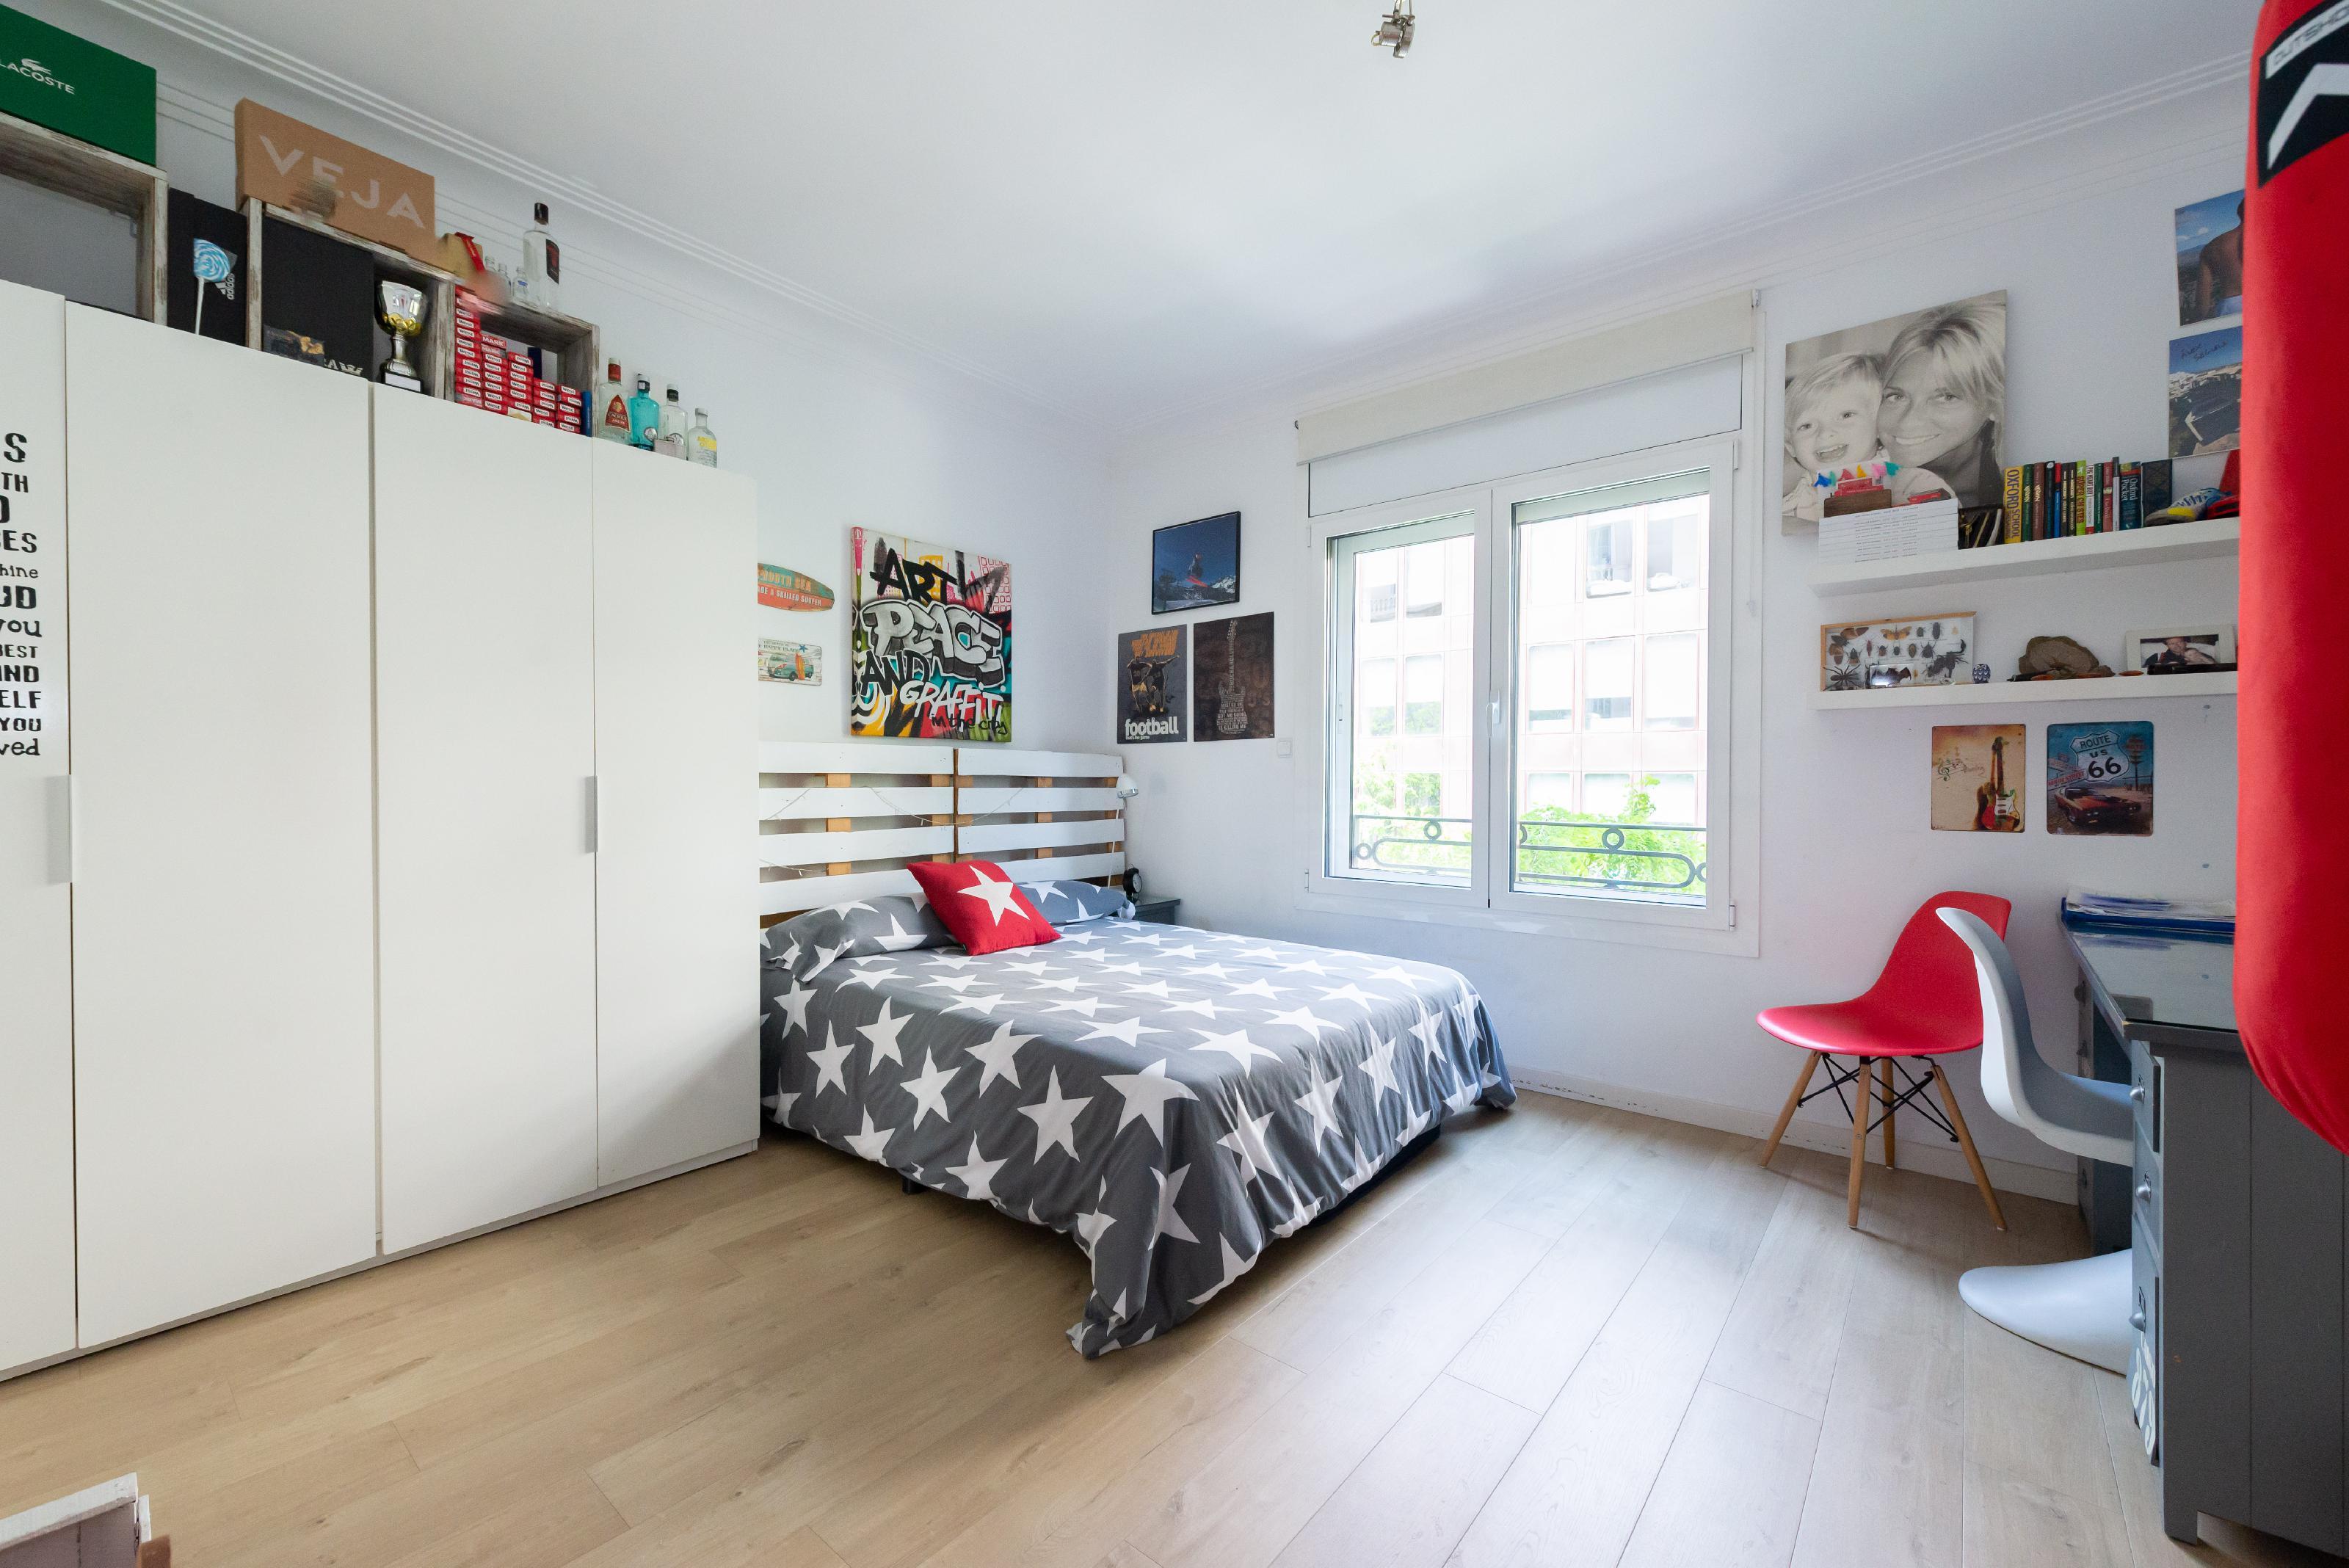 250005 Flat for sale in Sarrià-Sant Gervasi, Sant Gervasi-Galvany 31